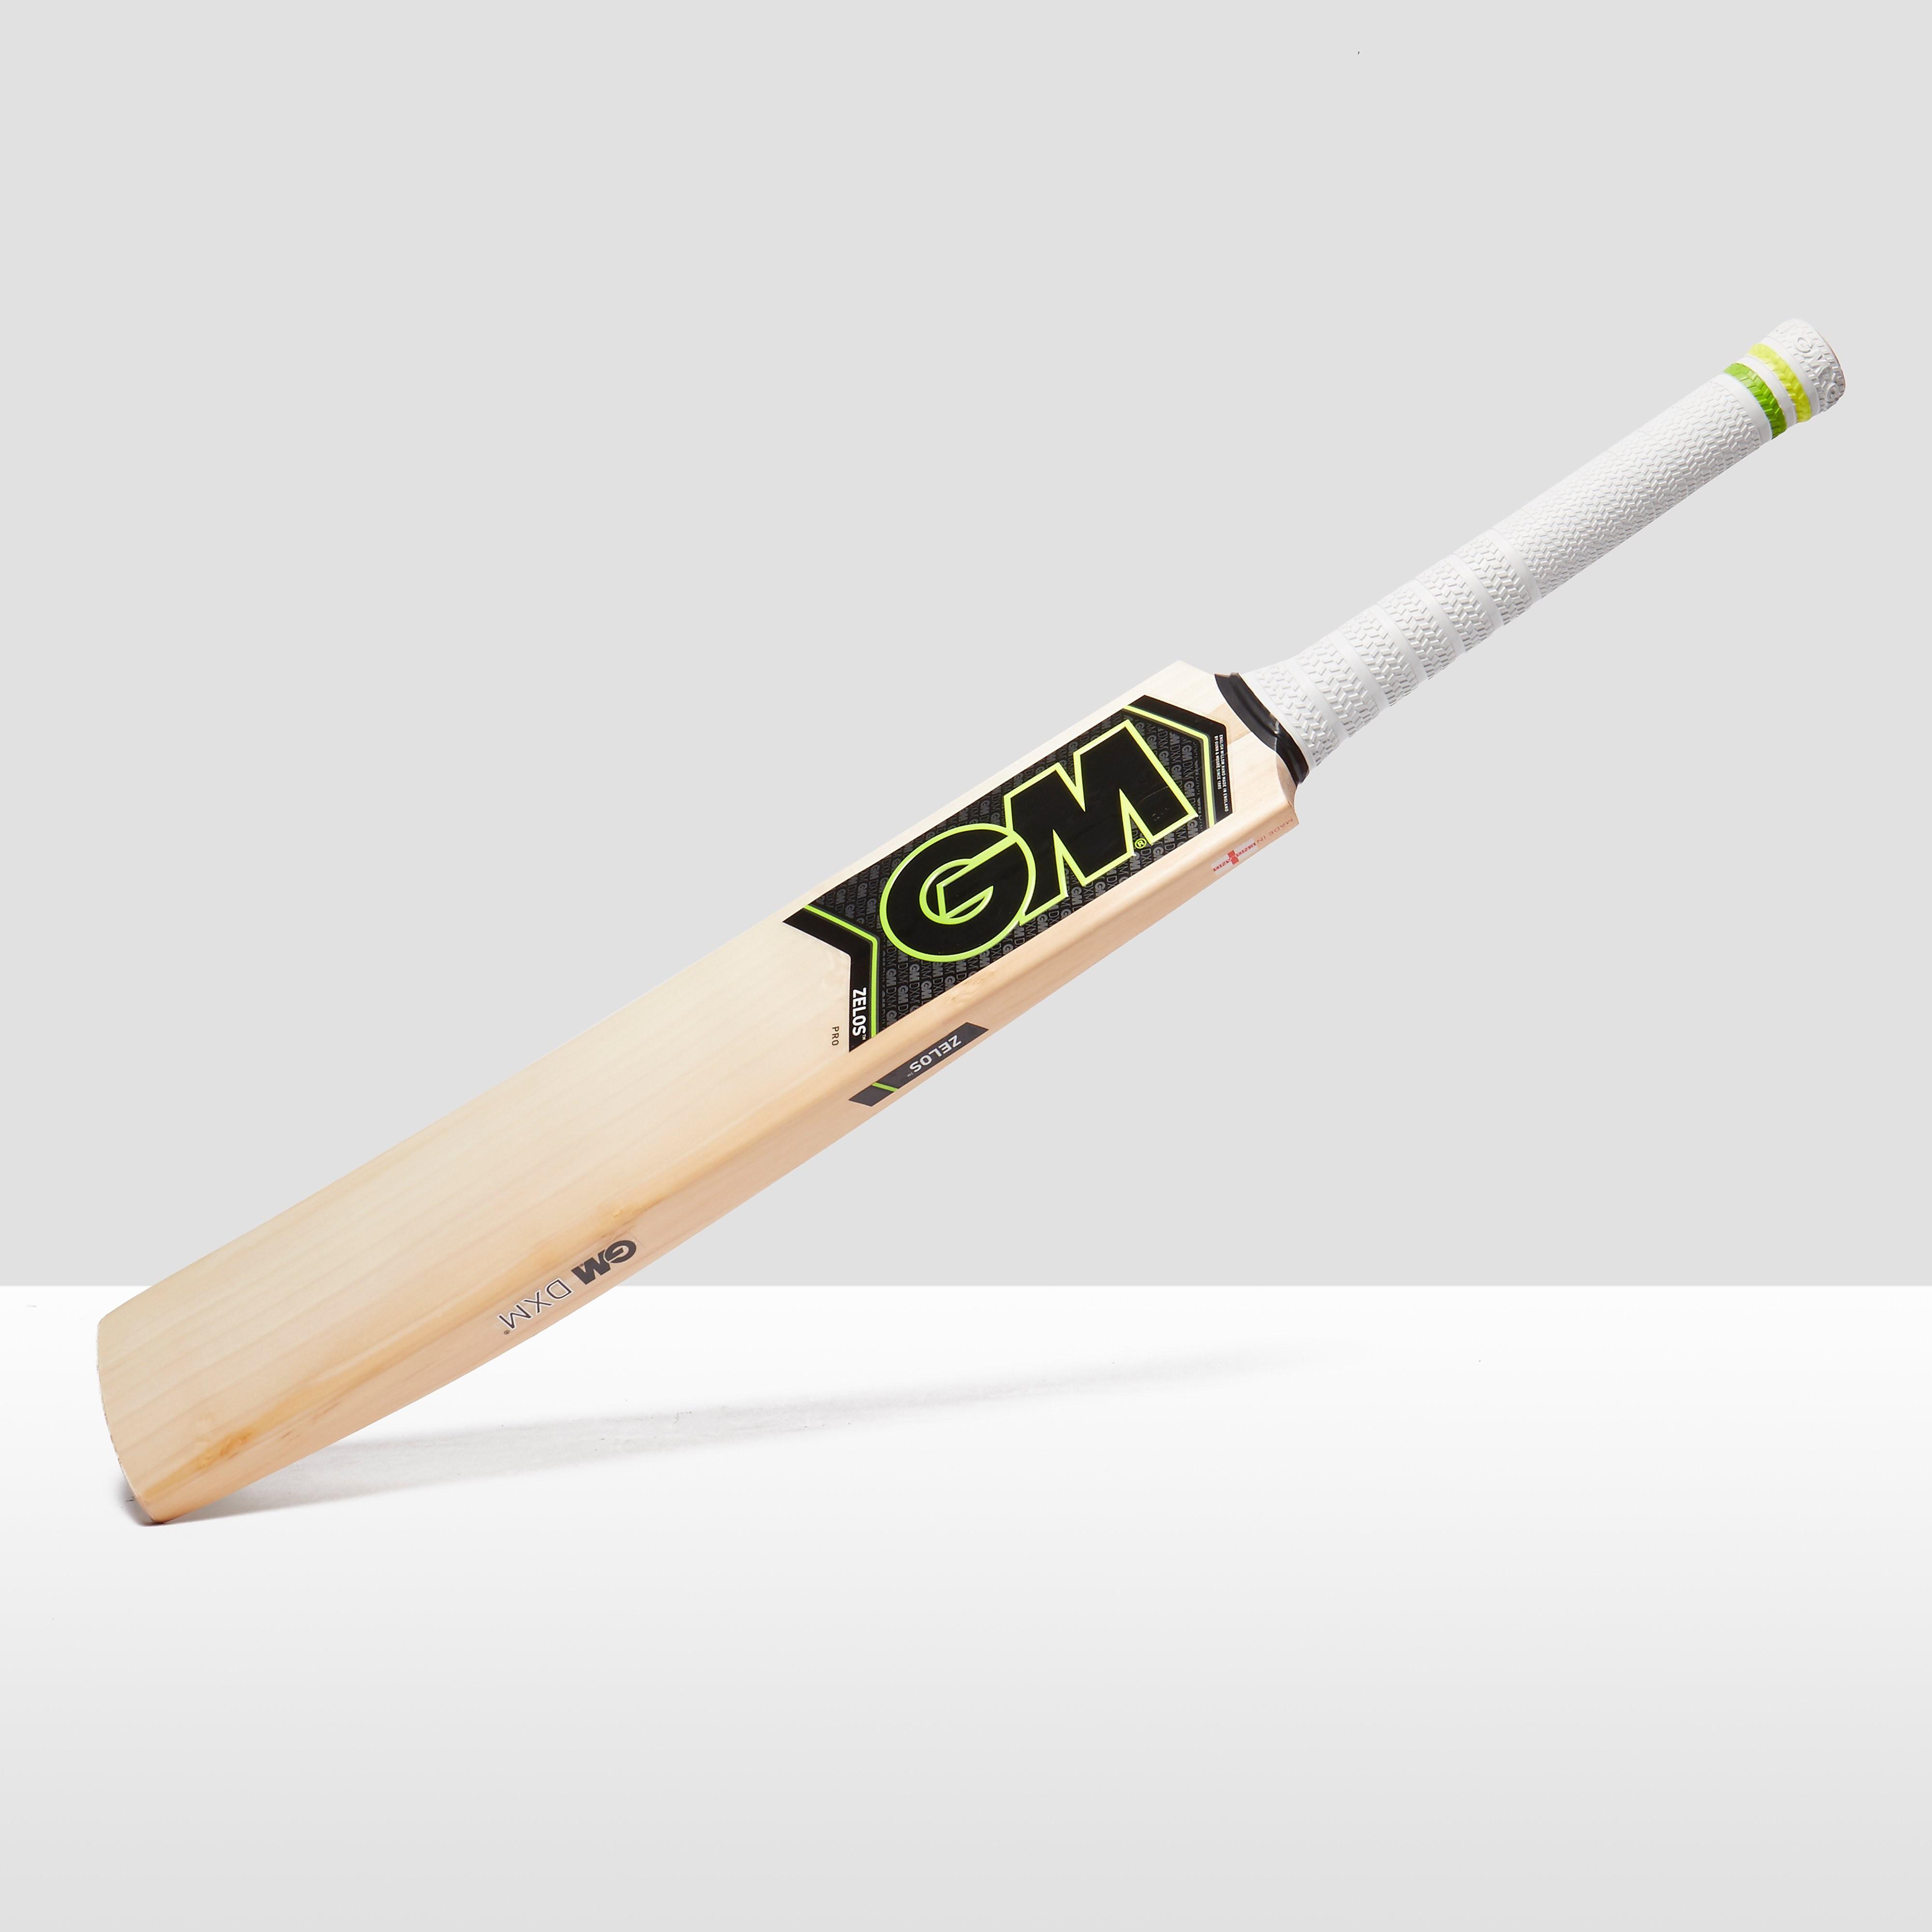 Gunn u0026 Moore Gunn & Moore Zelos L555 Pro Cricket Bat - White, White